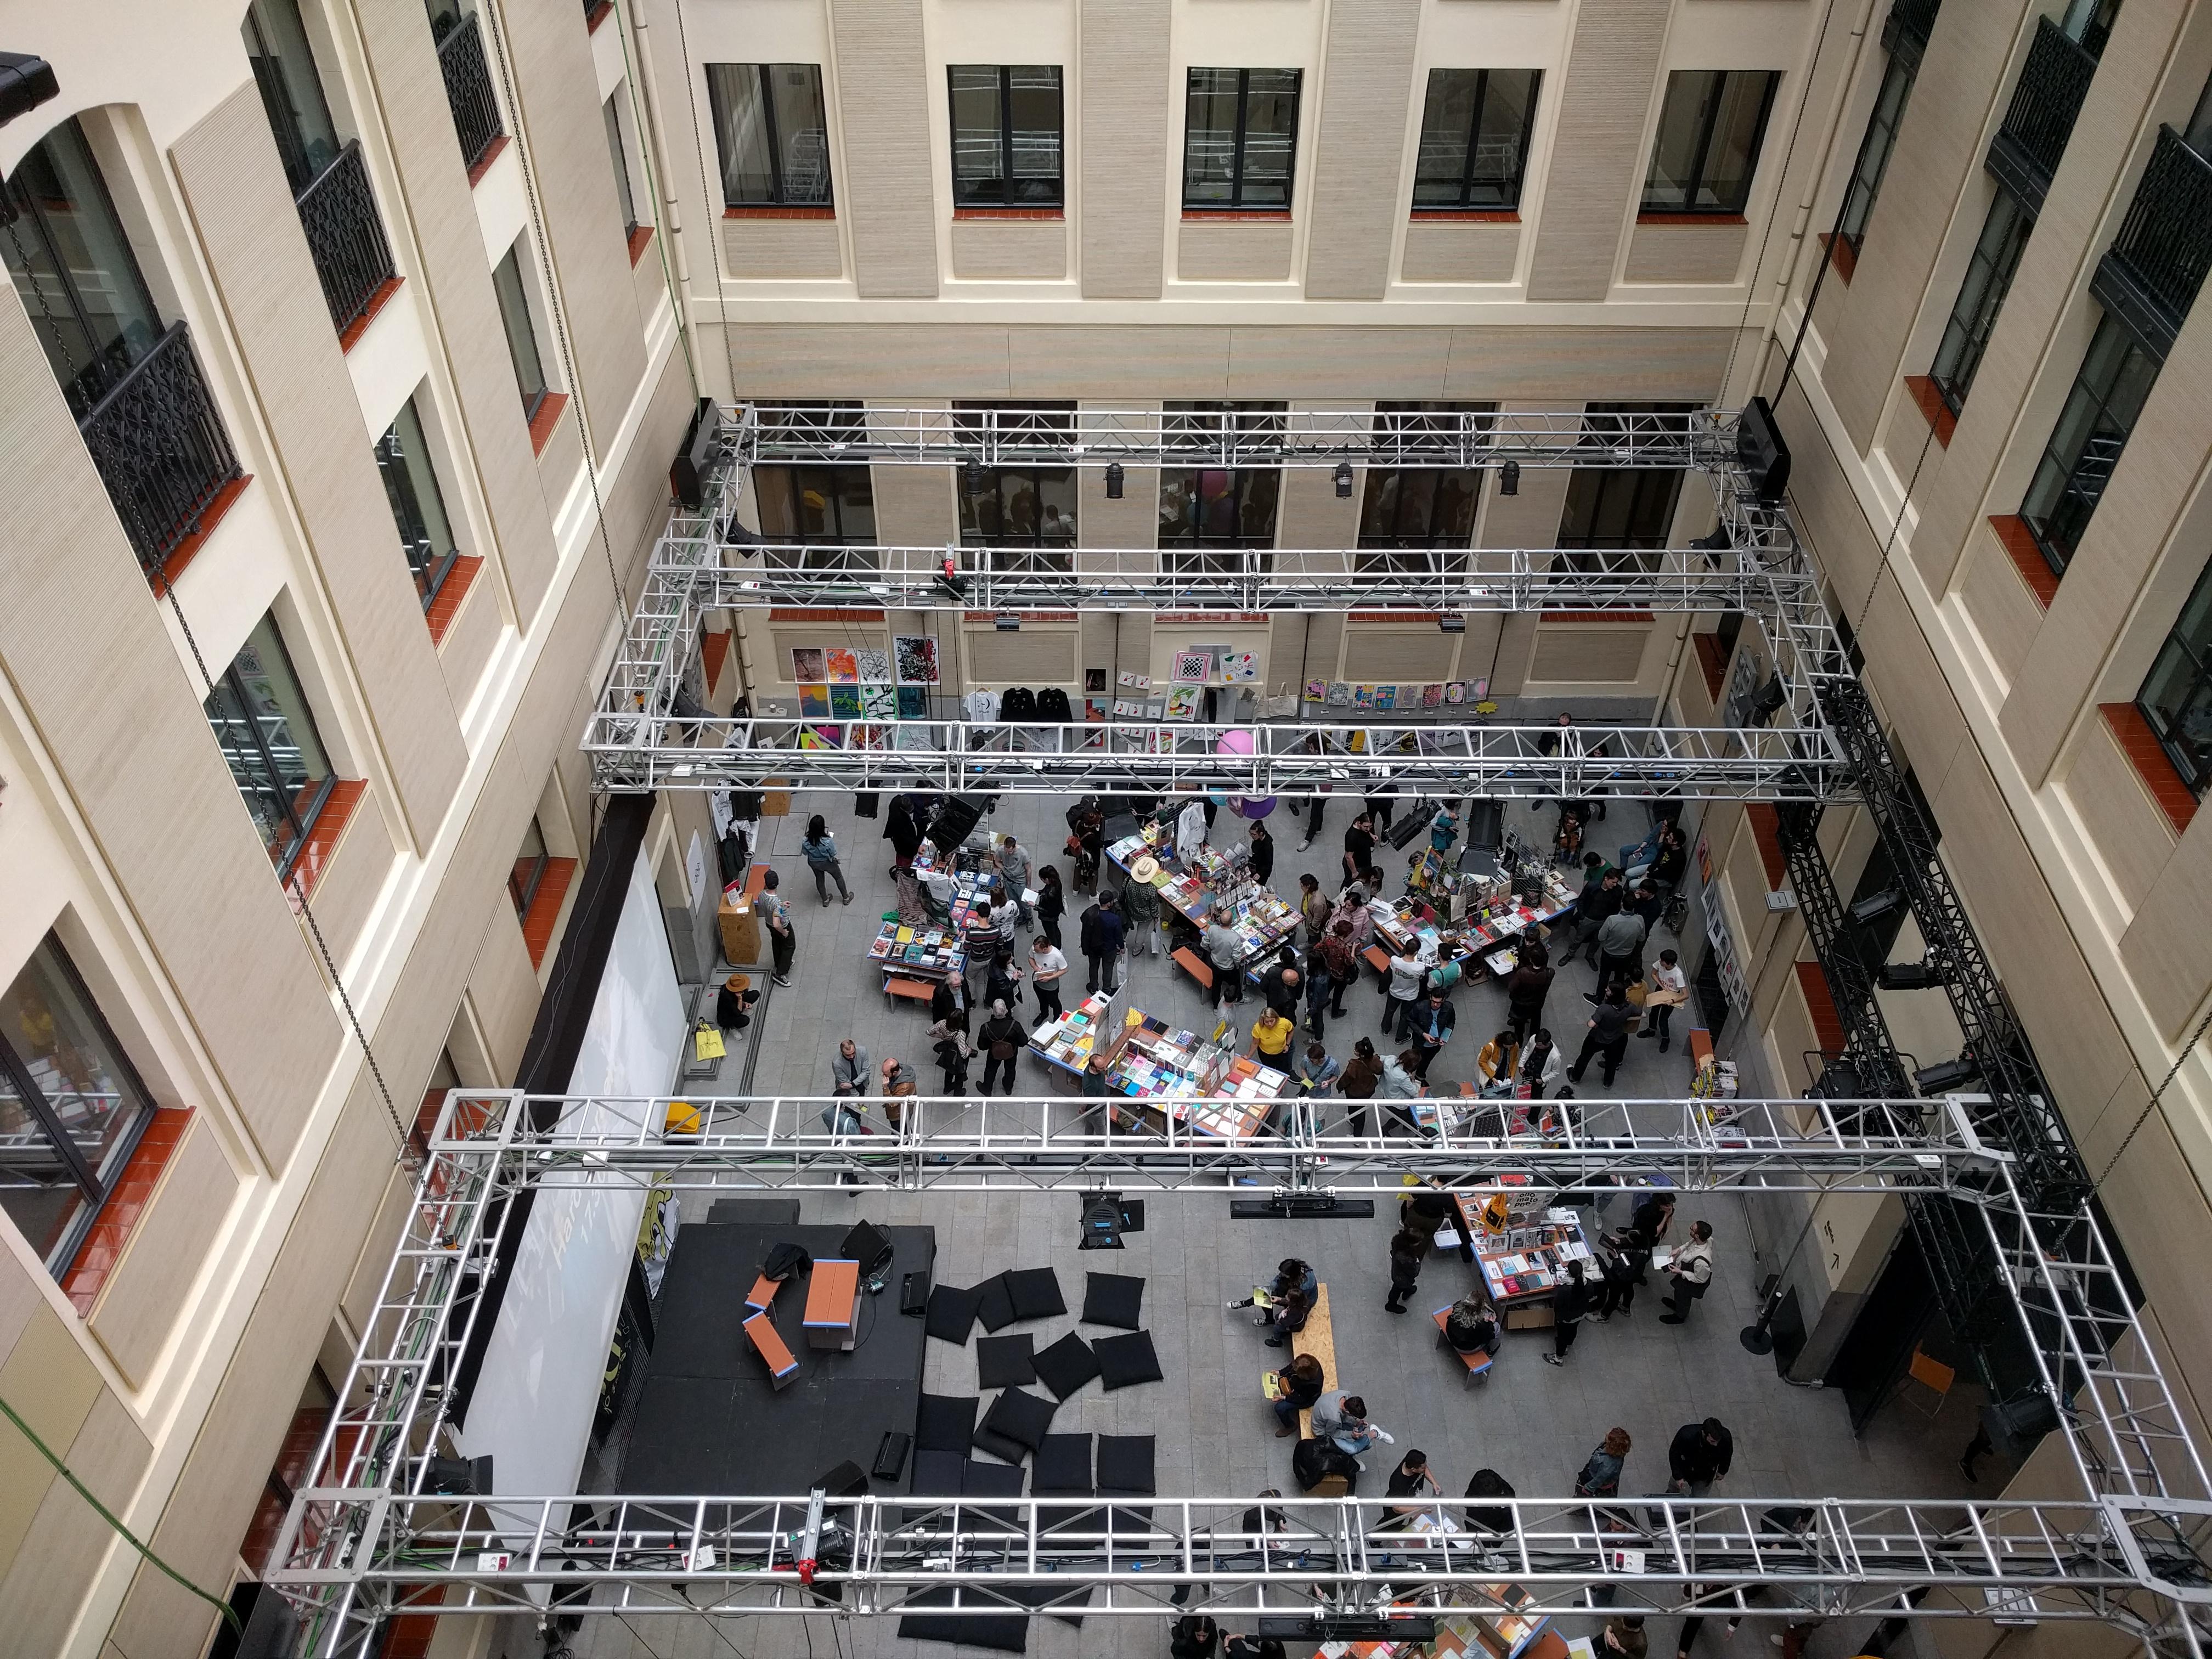 File Casa Encendida Patio Interior Madrid 2018 02 Jpg